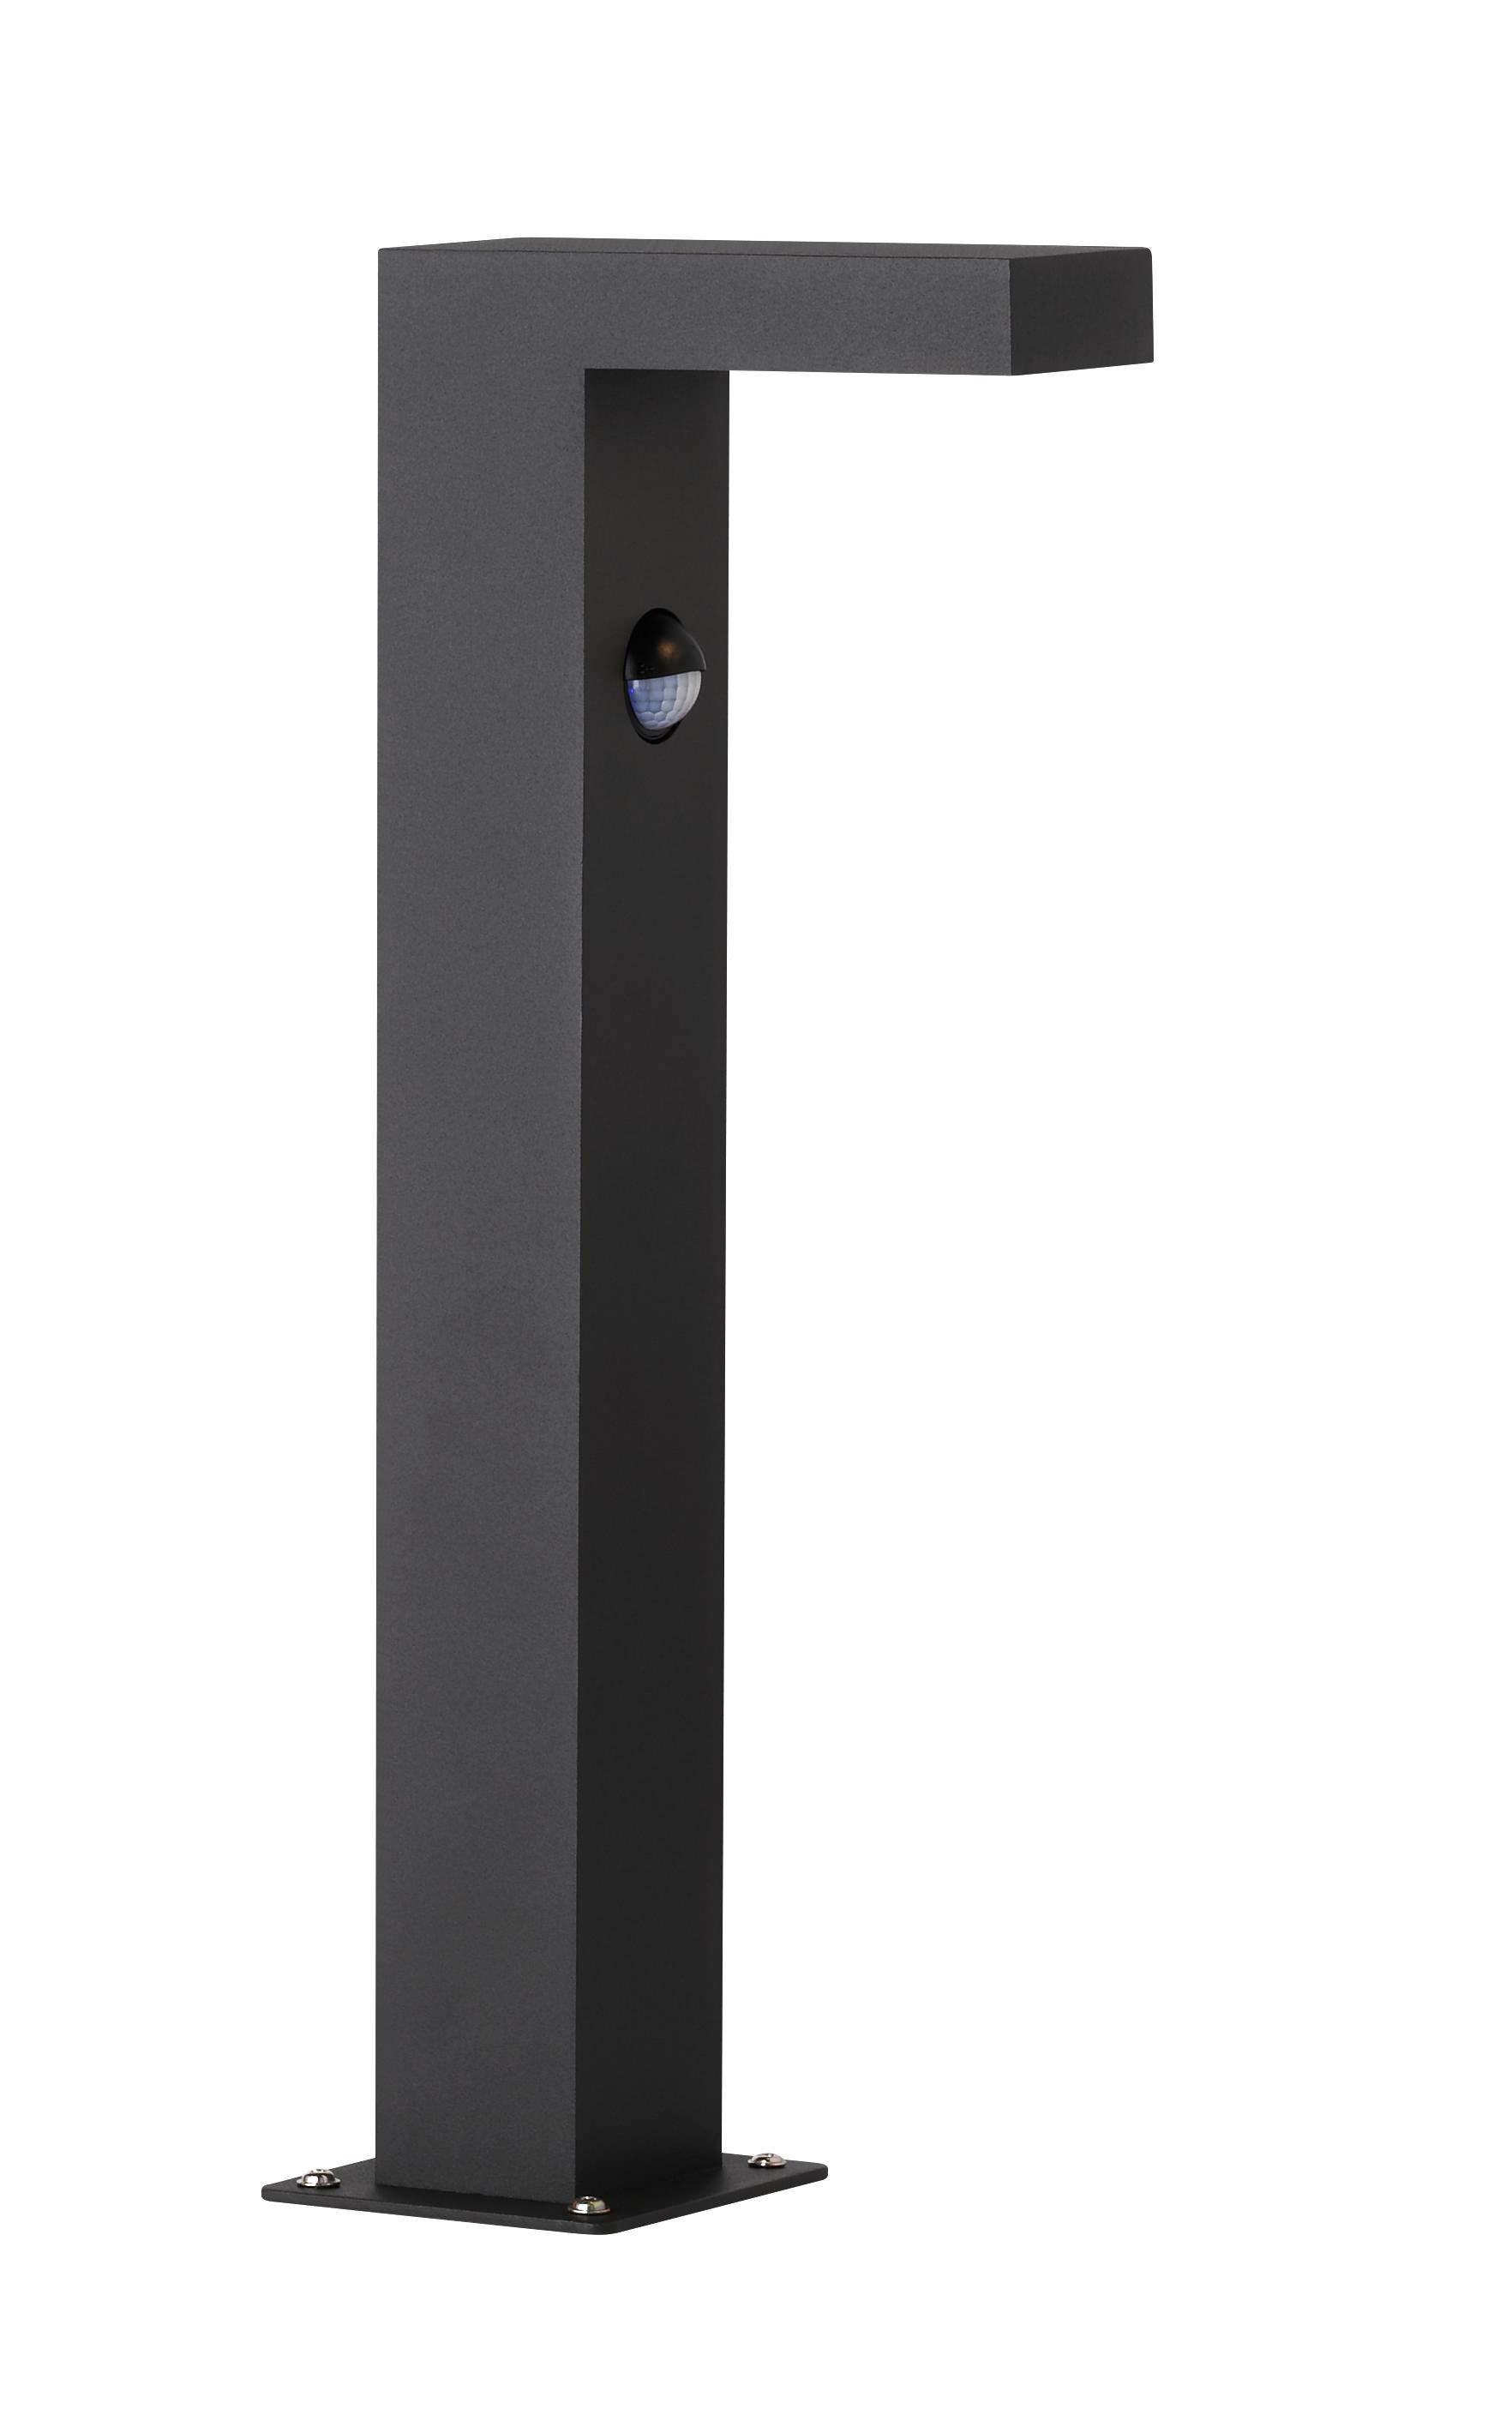 SOCKELLEUCHTE - Anthrazit, Design, Metall (40/6/15cm)